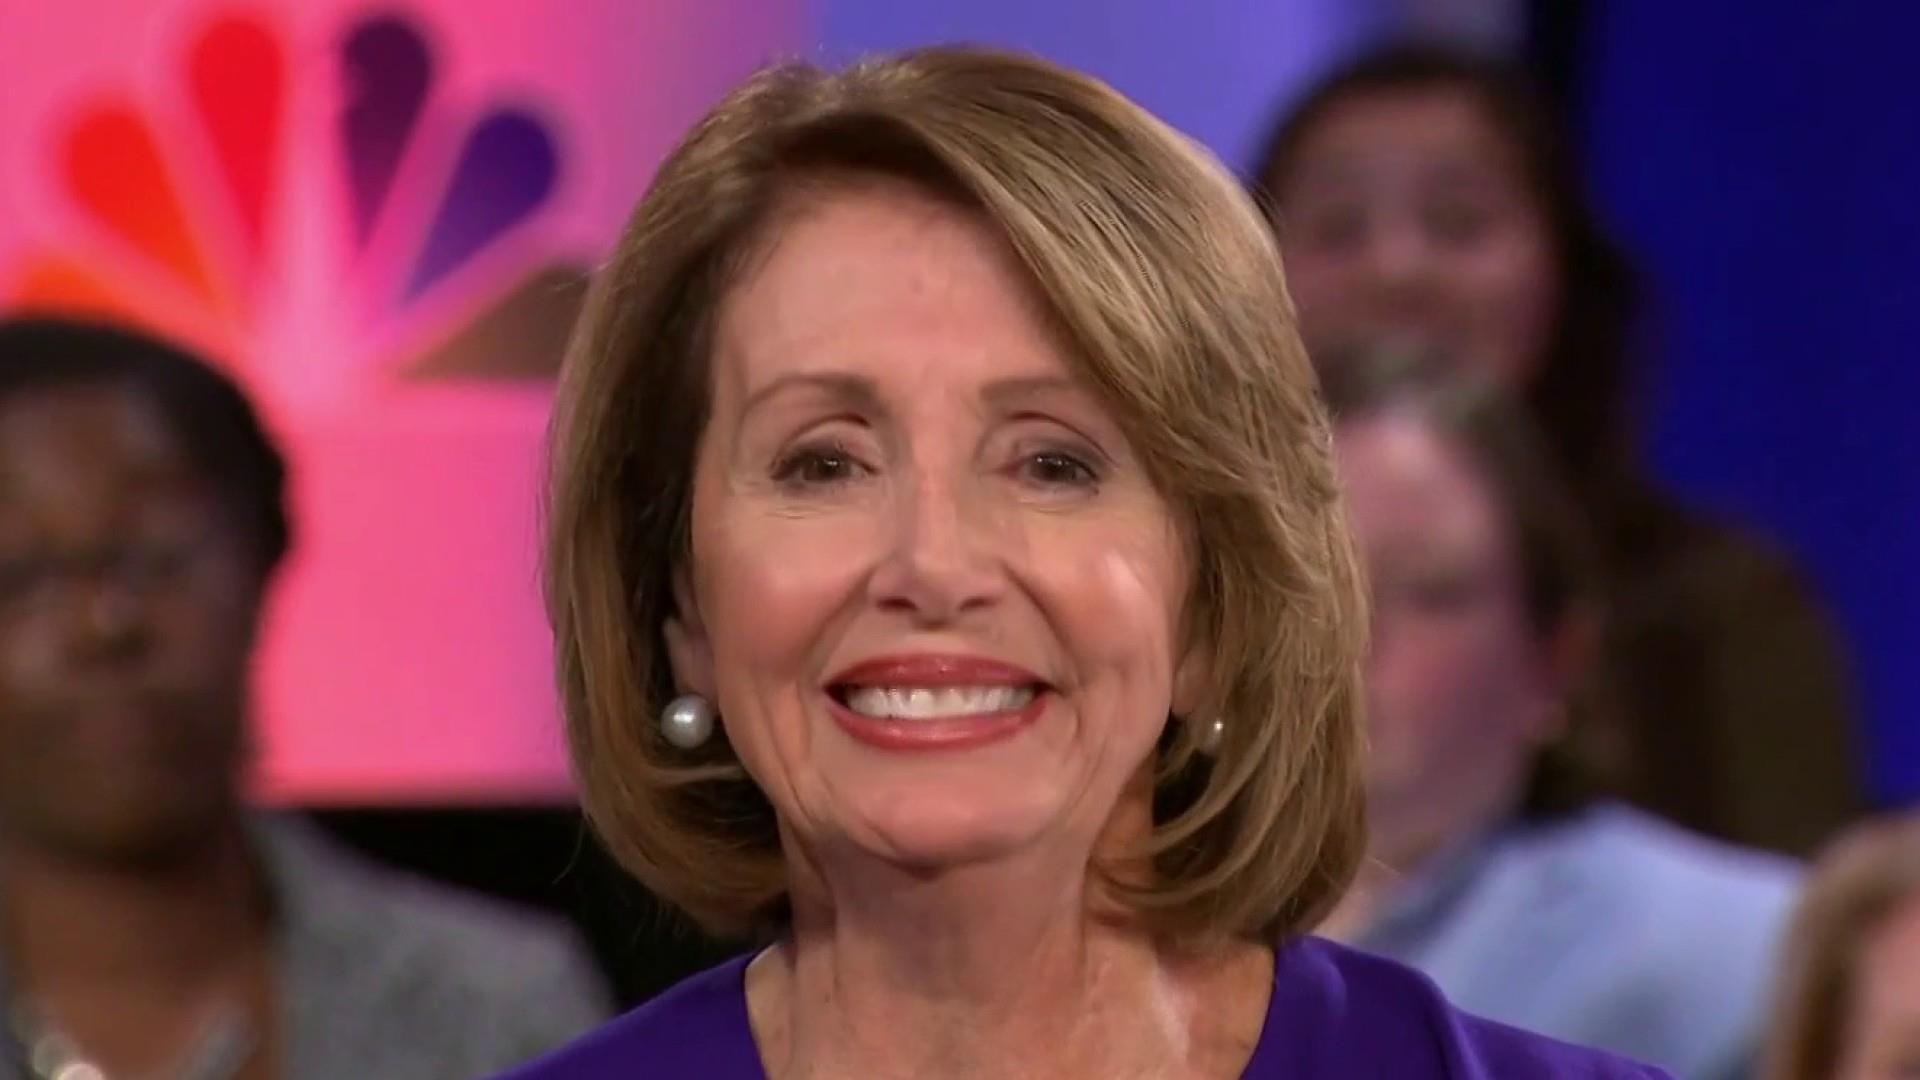 Speaker Pelosi on investigations and talk of impeachment